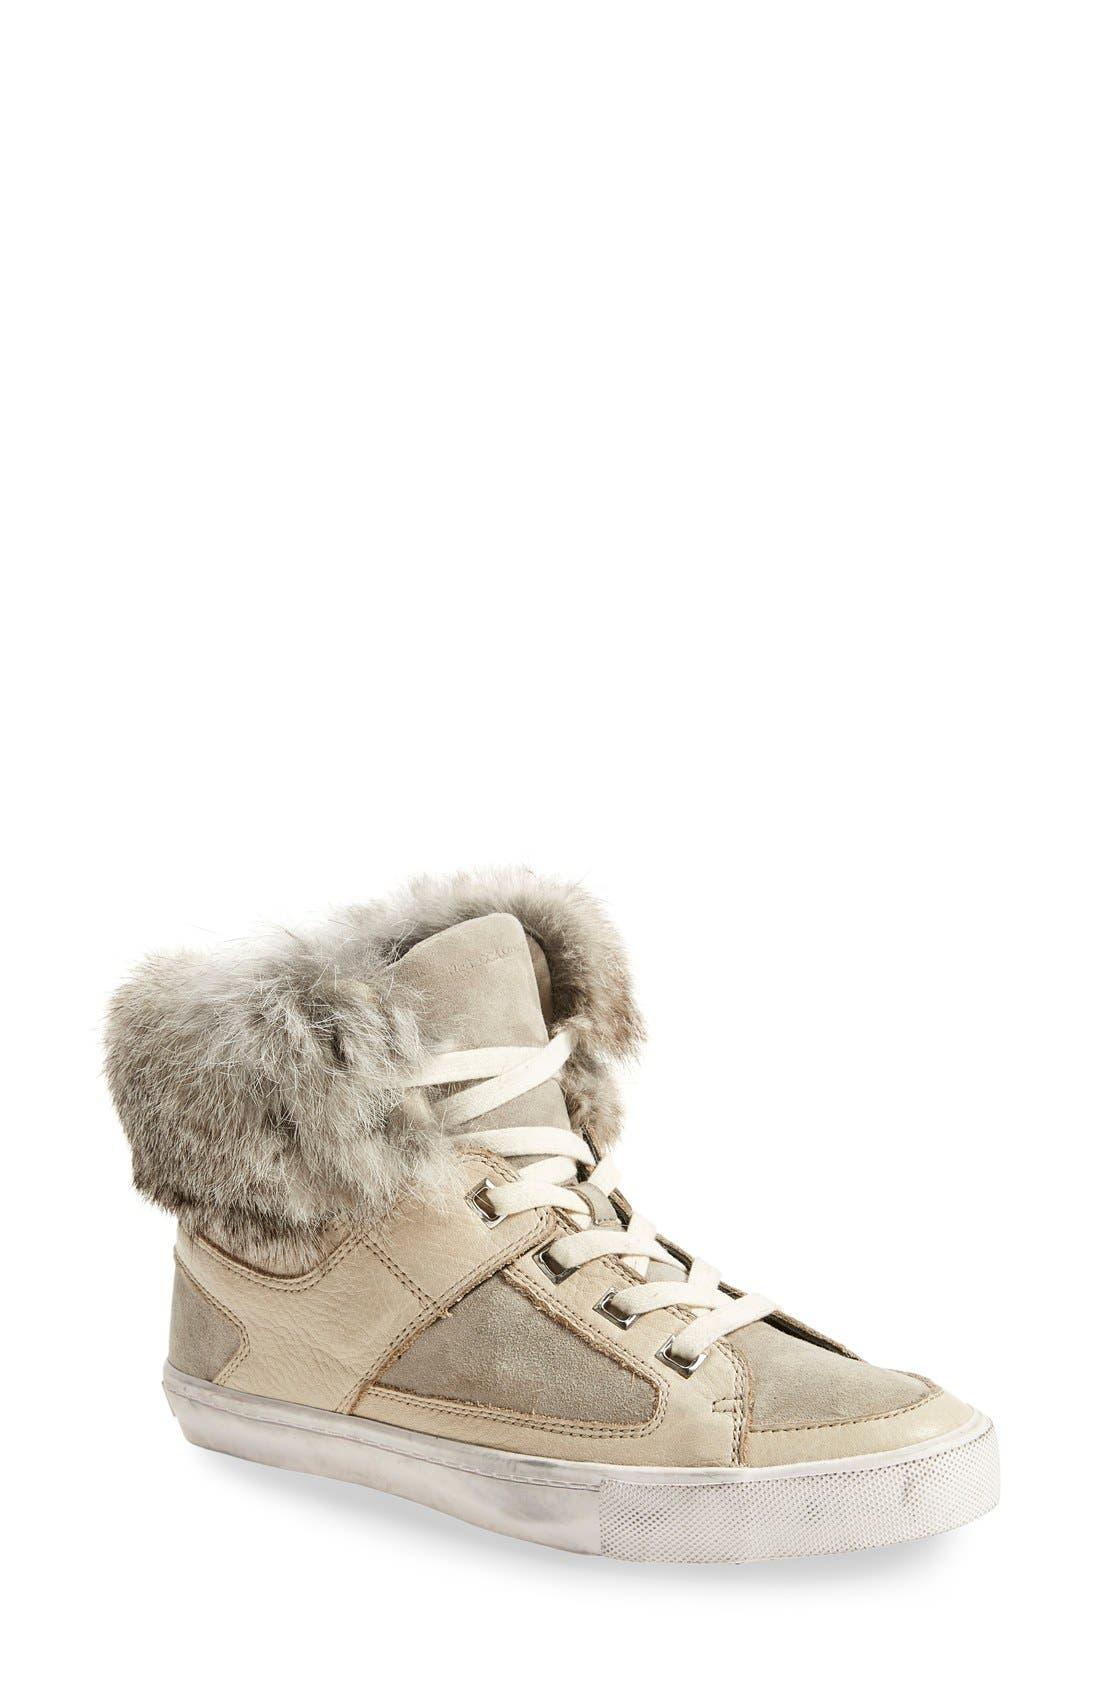 Main Image - Rebecca Minkoff'Shiloh' Genuine Rabbit Fur CollarSneaker (Women)